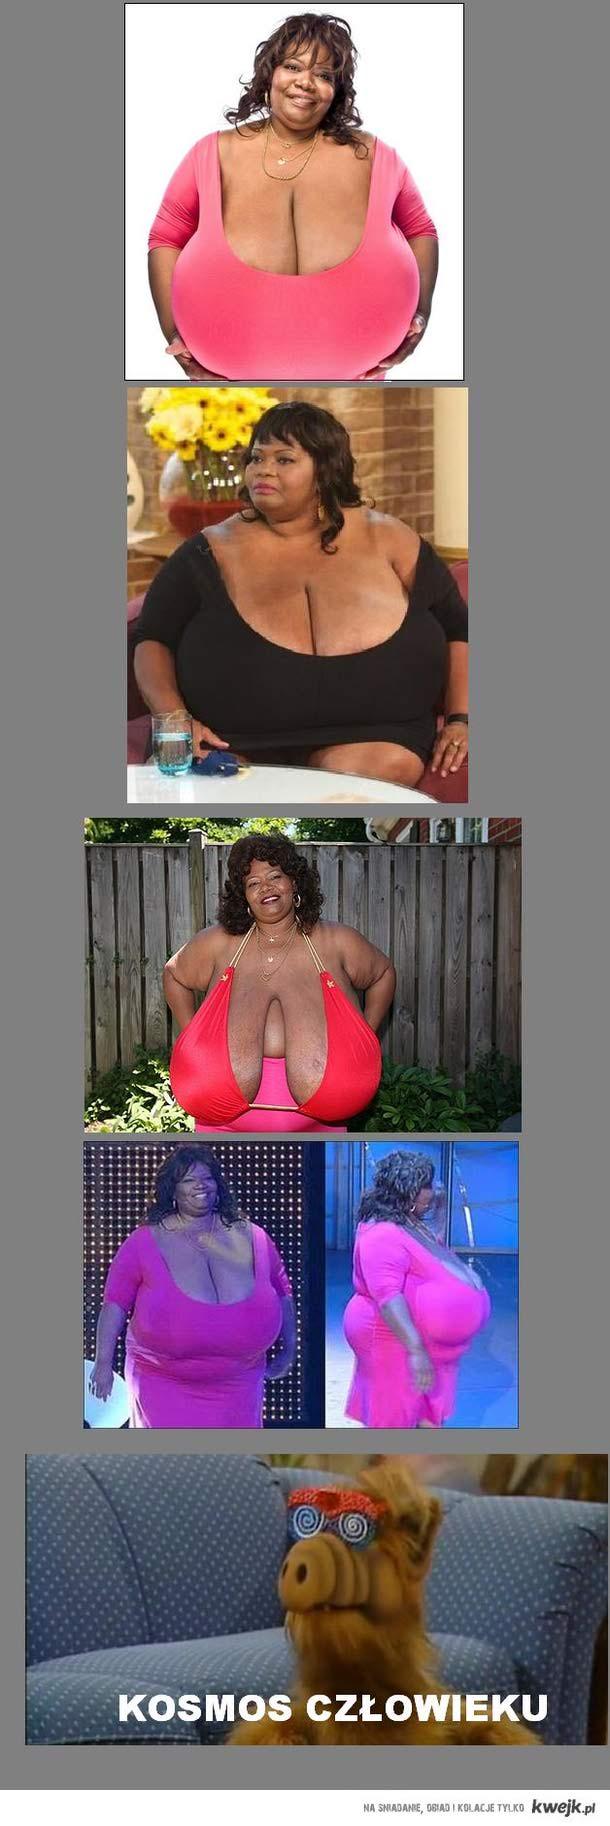 World's biggest boobs